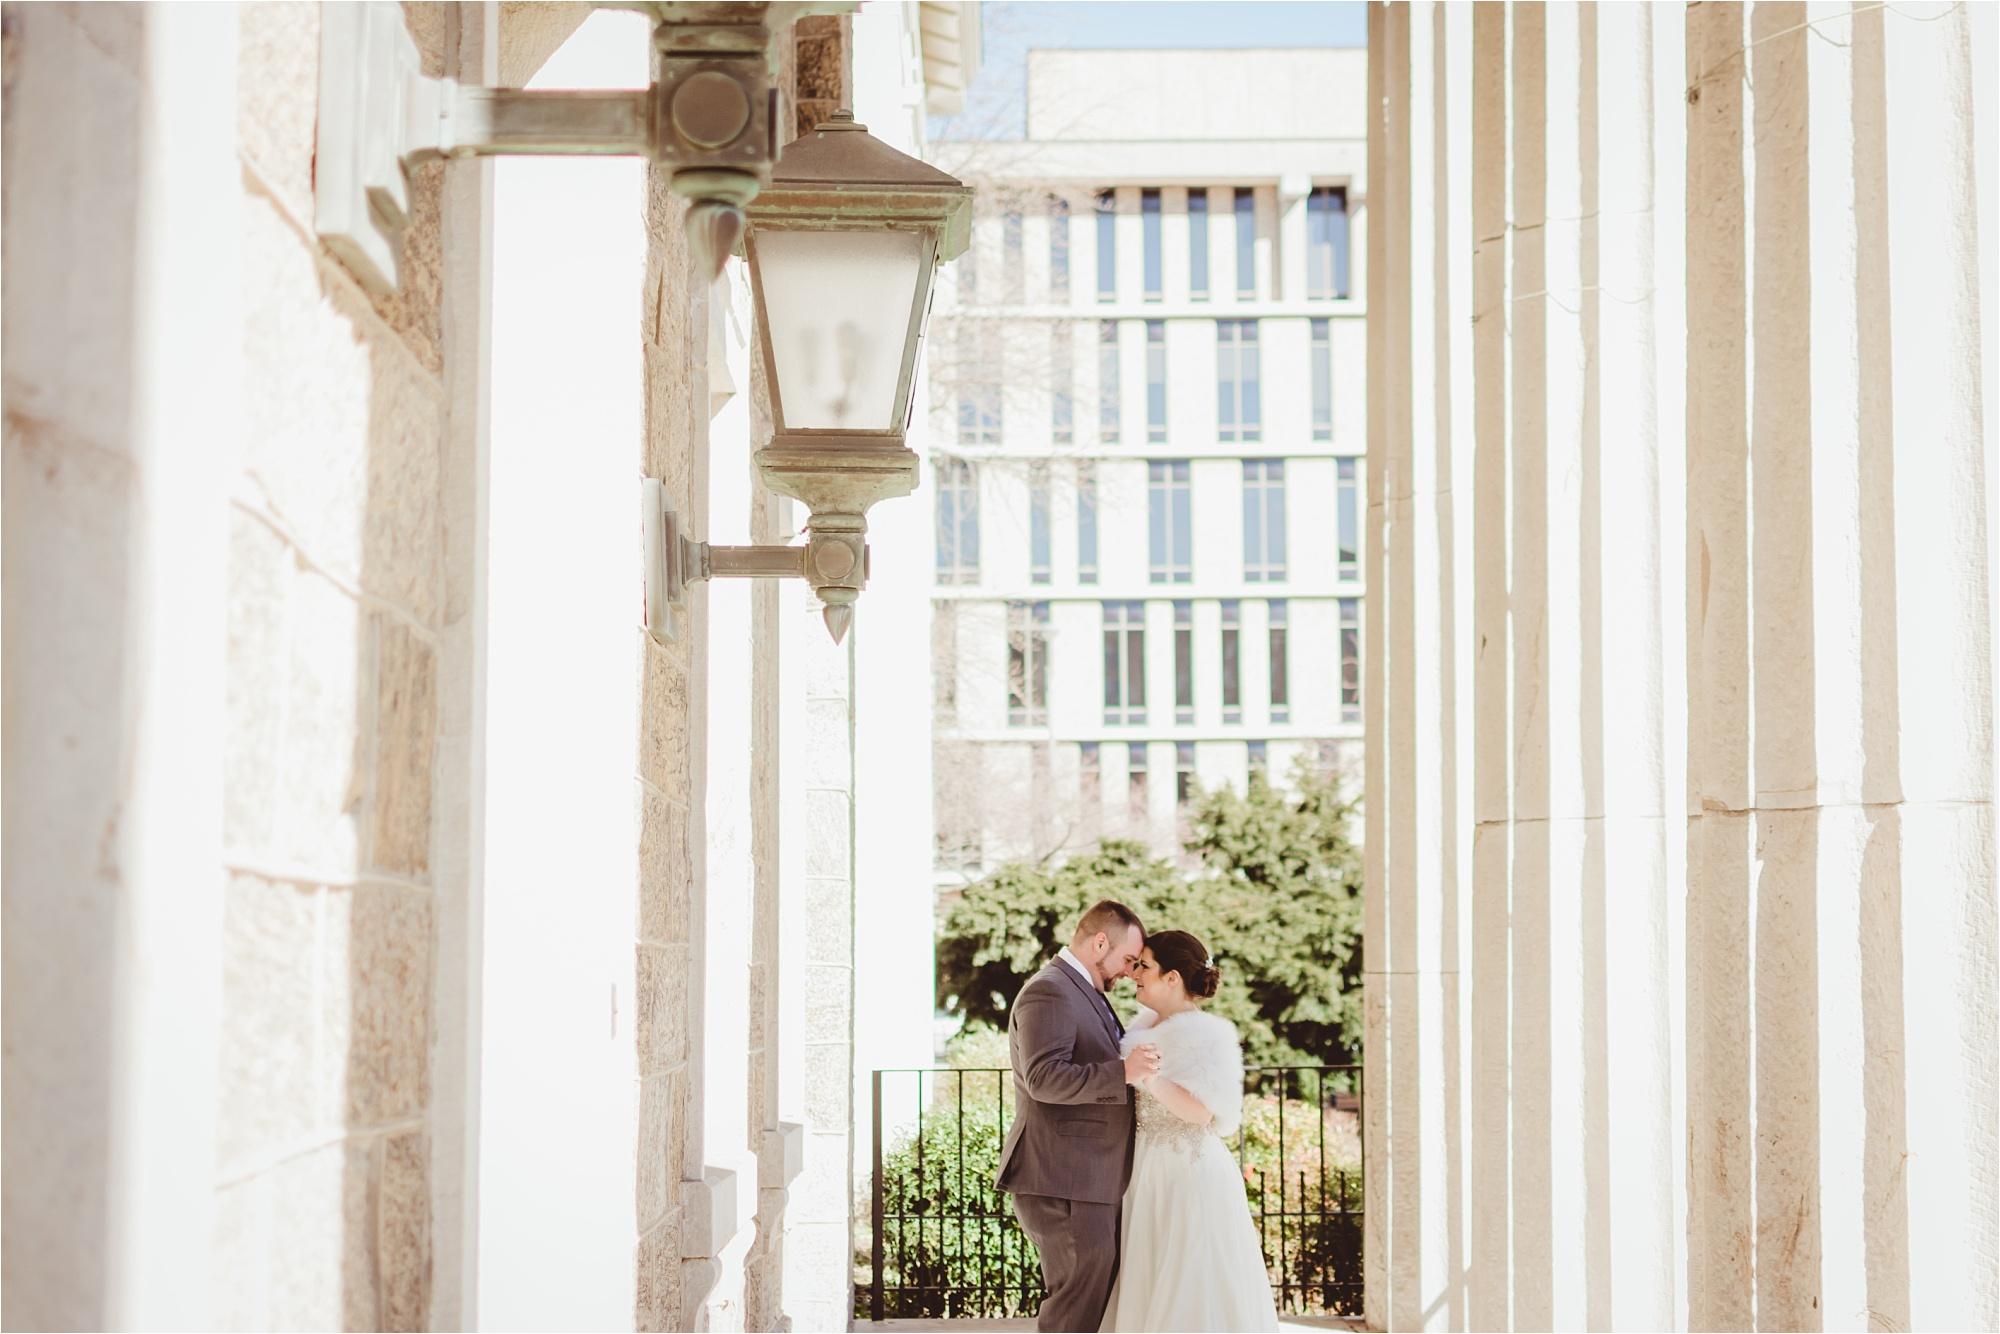 brittney-nestle-photo-kyle-and-courtney-towson-elopement.jpg